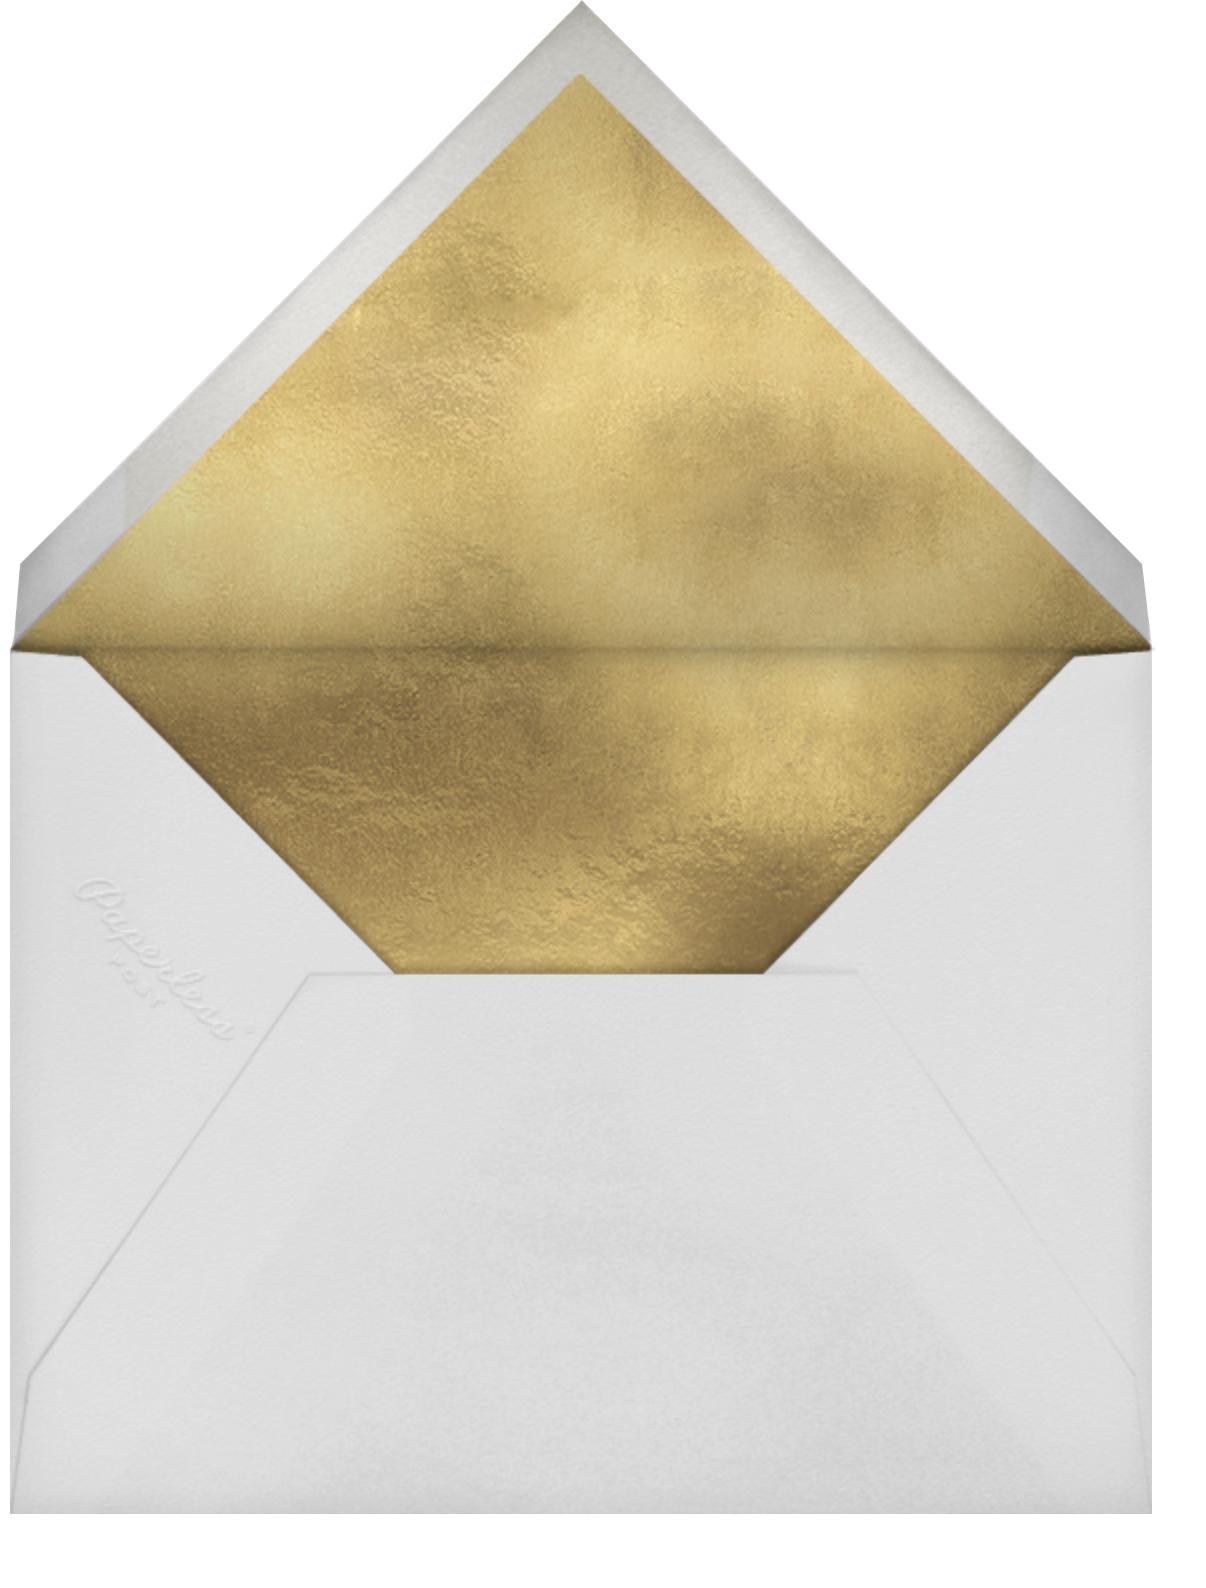 Baby Penguin - Rifle Paper Co. - Baby shower - envelope back